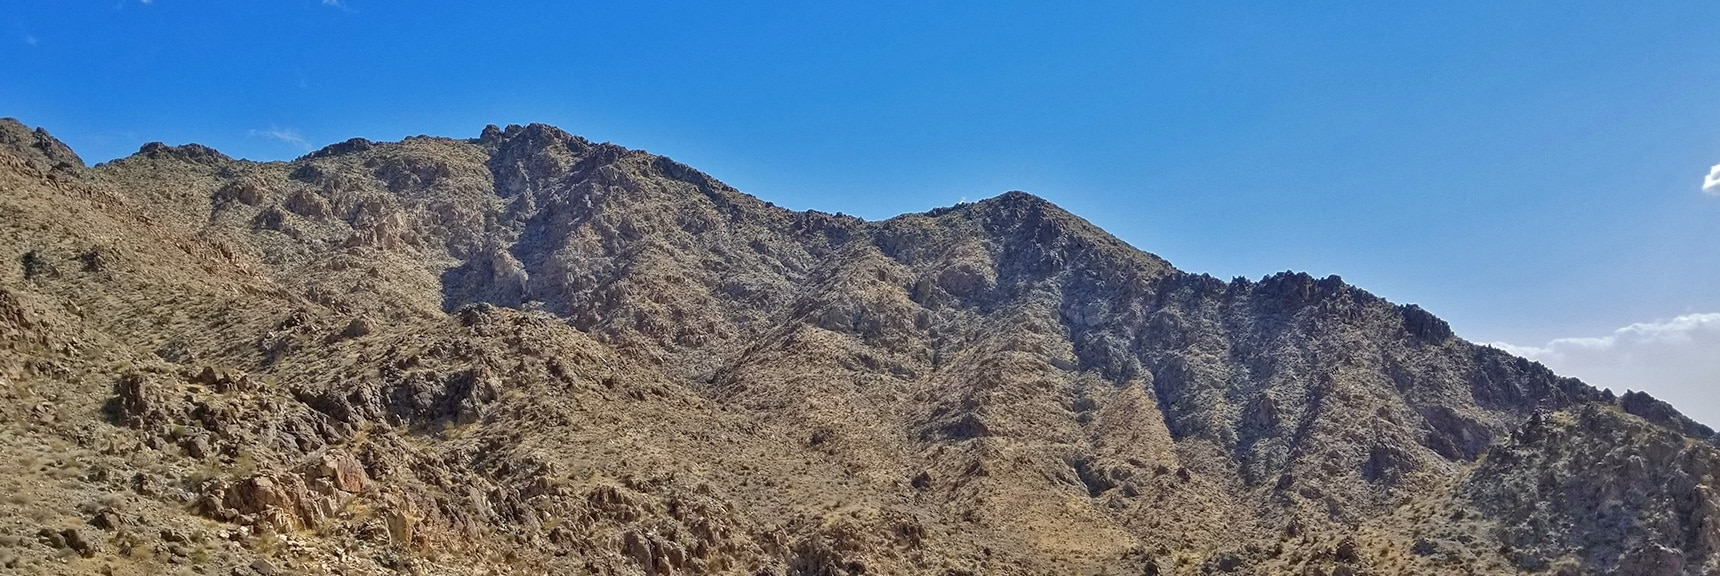 Ridge System Below Mt. Wilson | Mt Wilson, Black Mountains, Arizona, Lake Mead National Recreation Area